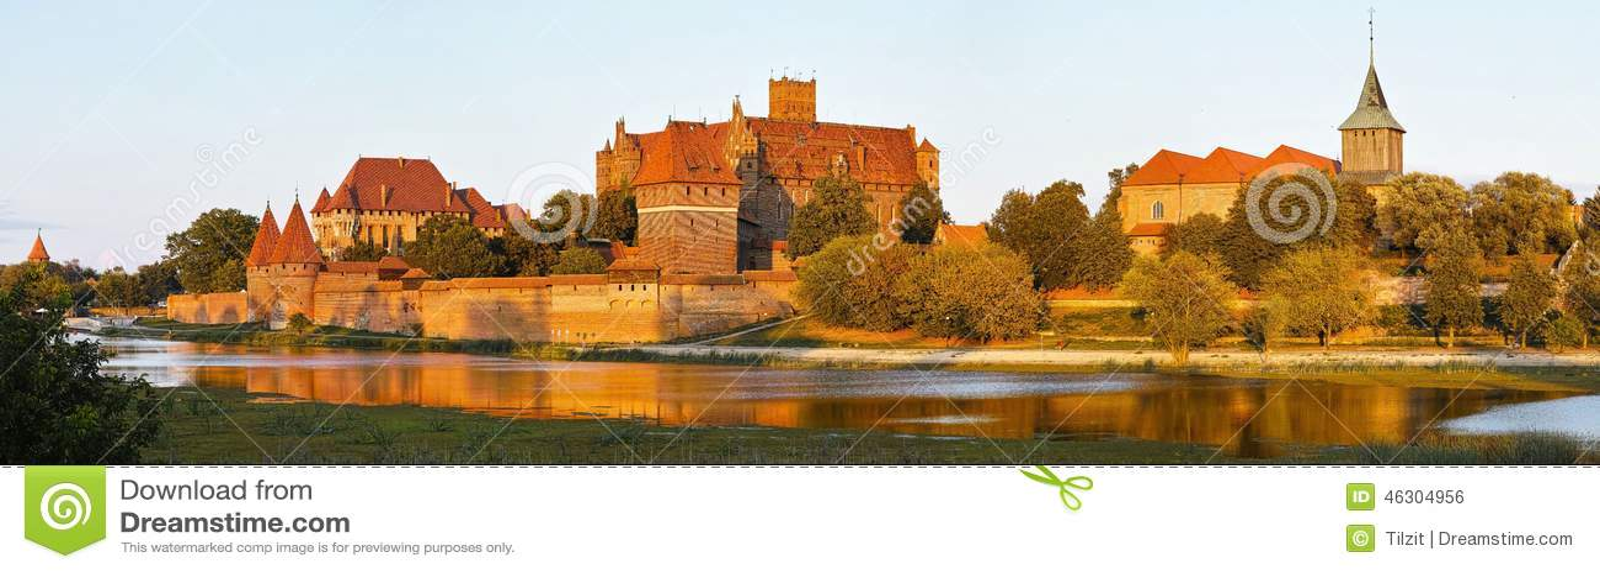 Mening van Malbork-kasteel in Polen